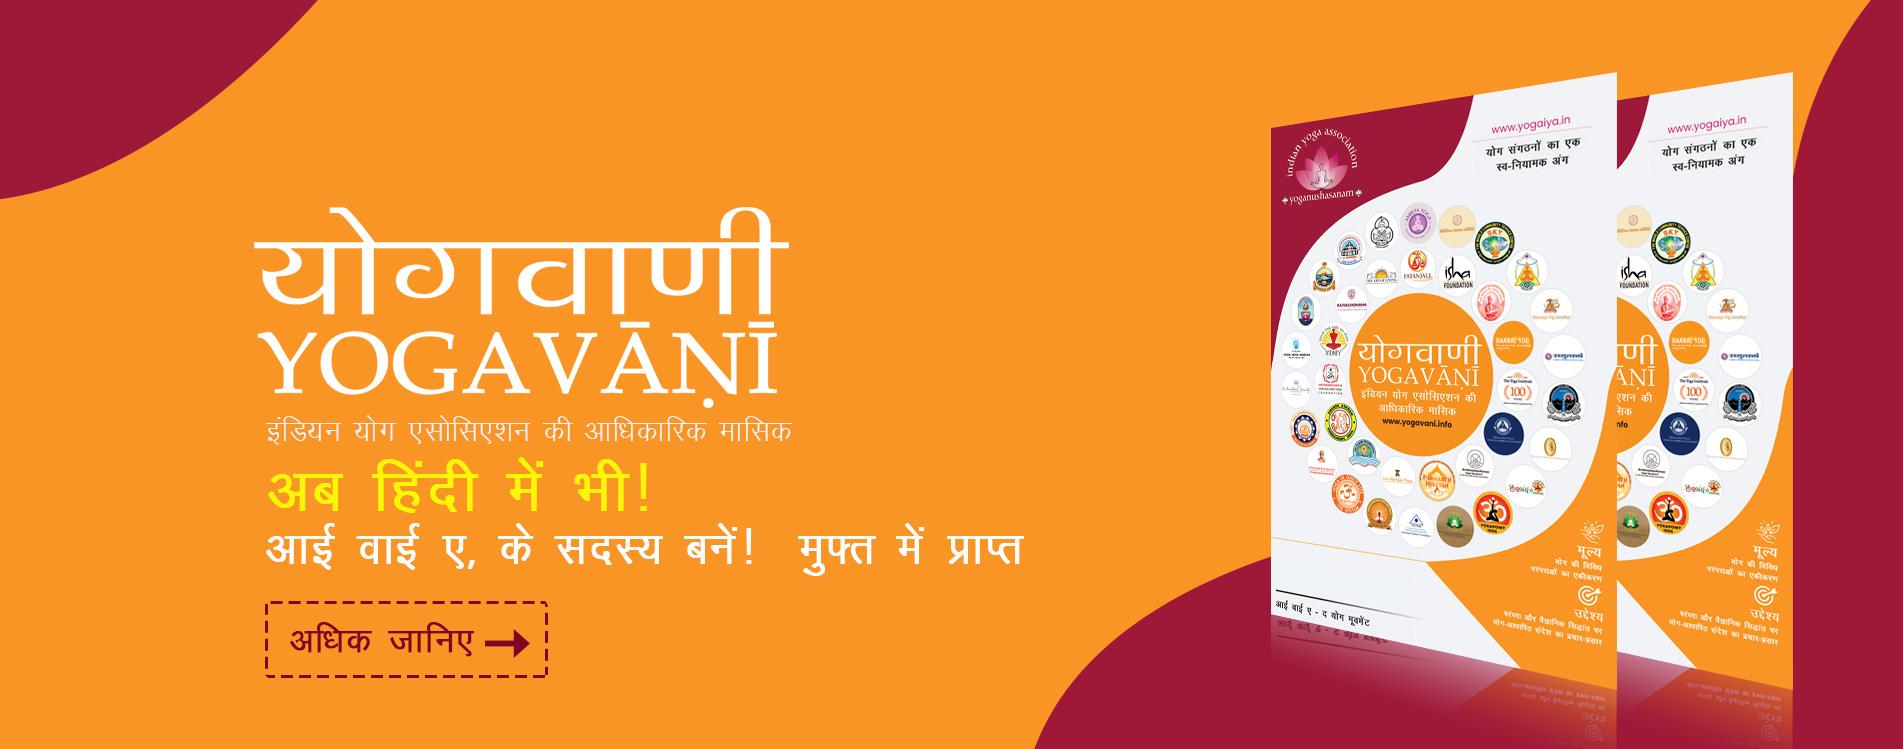 yogavani-hindi-slider